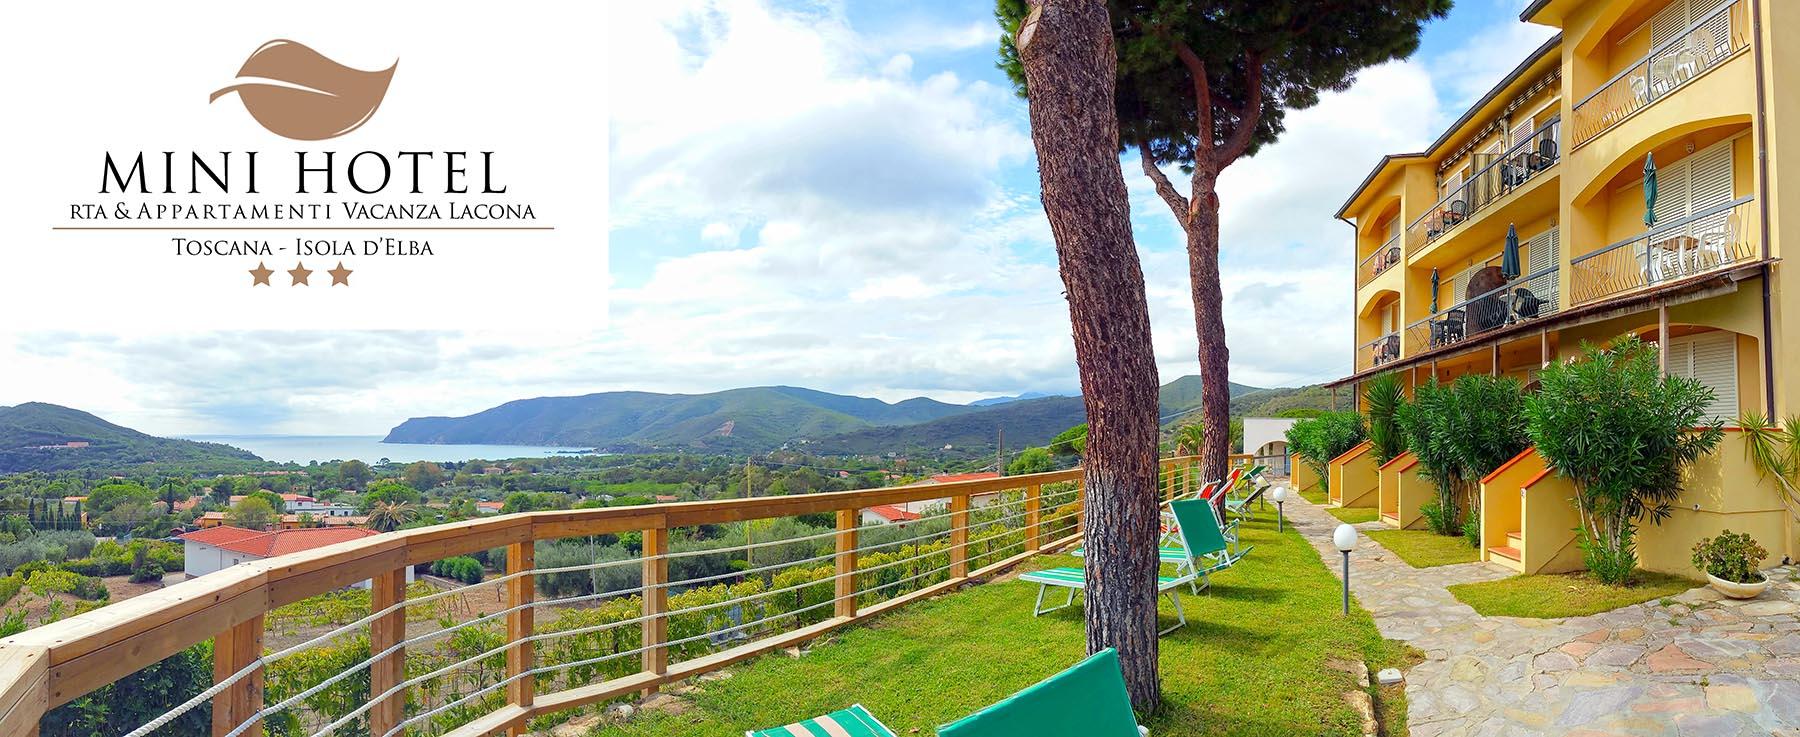 panoramica mini hotel